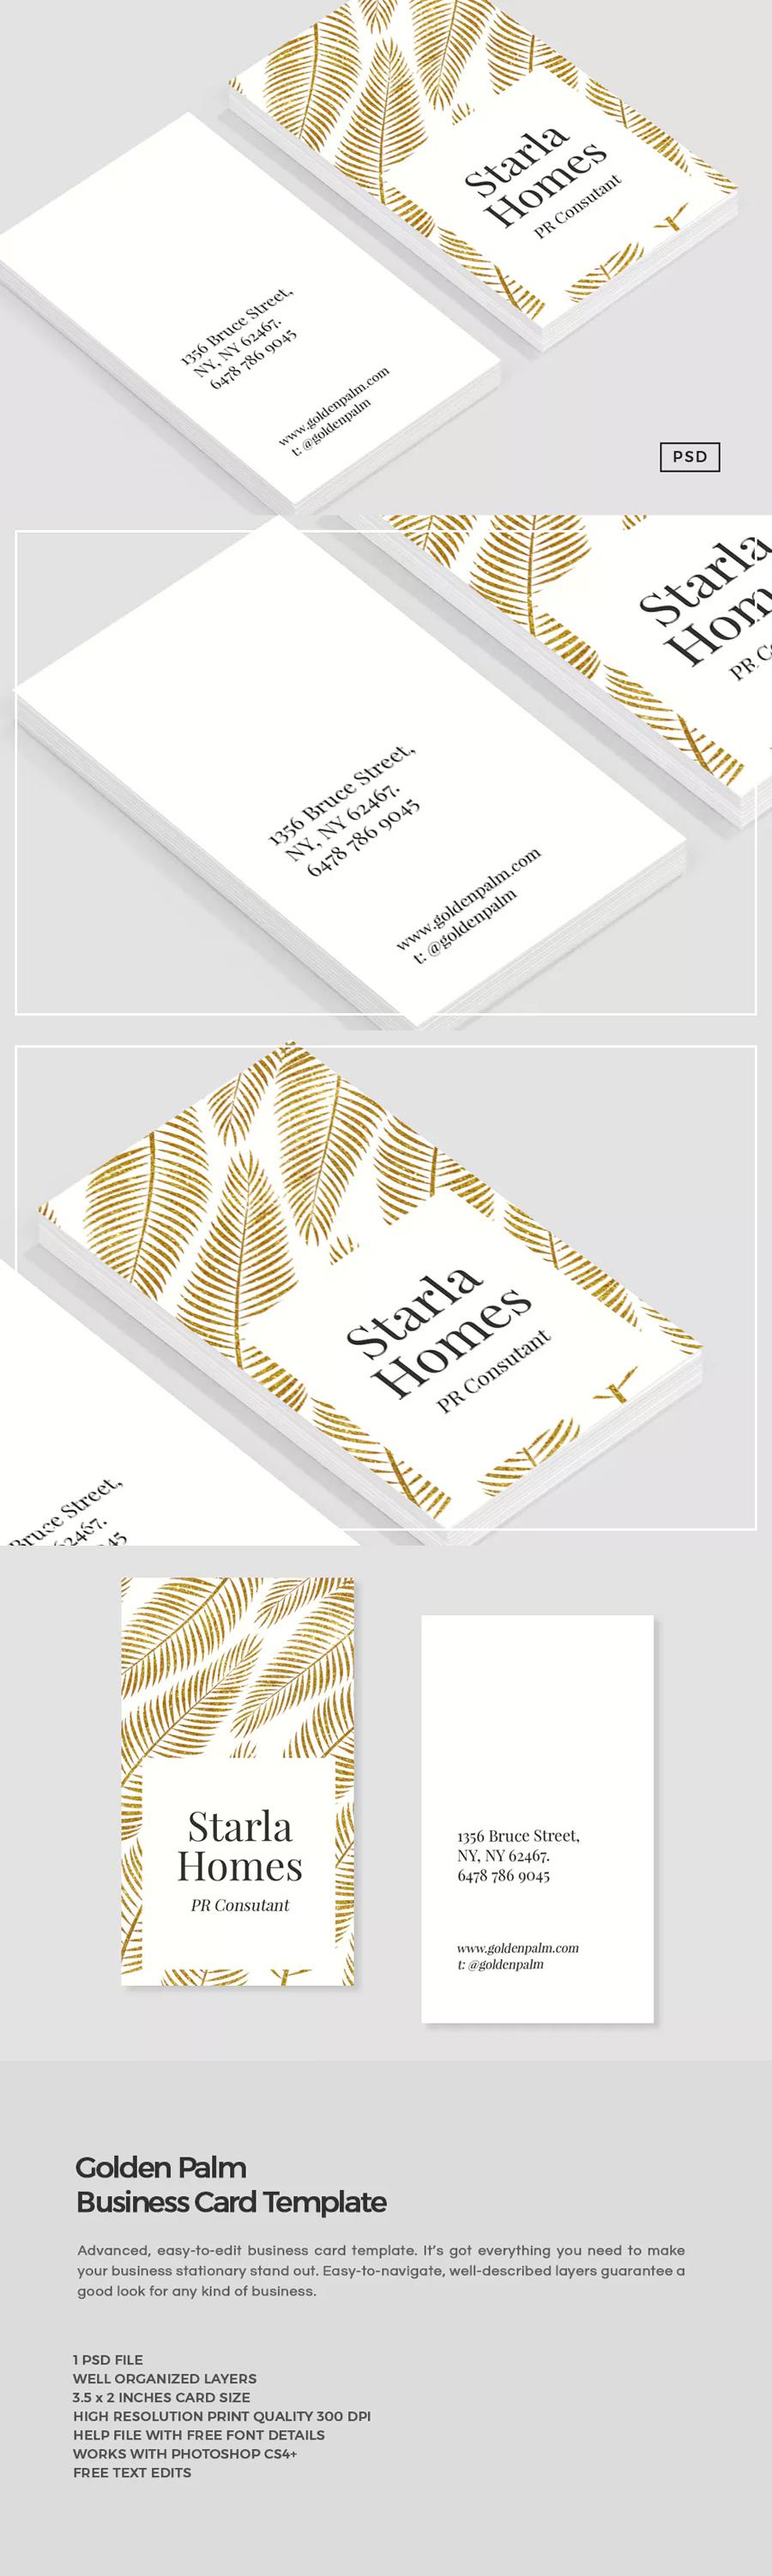 Golden palm business card template psd business card inspiration golden palm business card template psd reheart Images